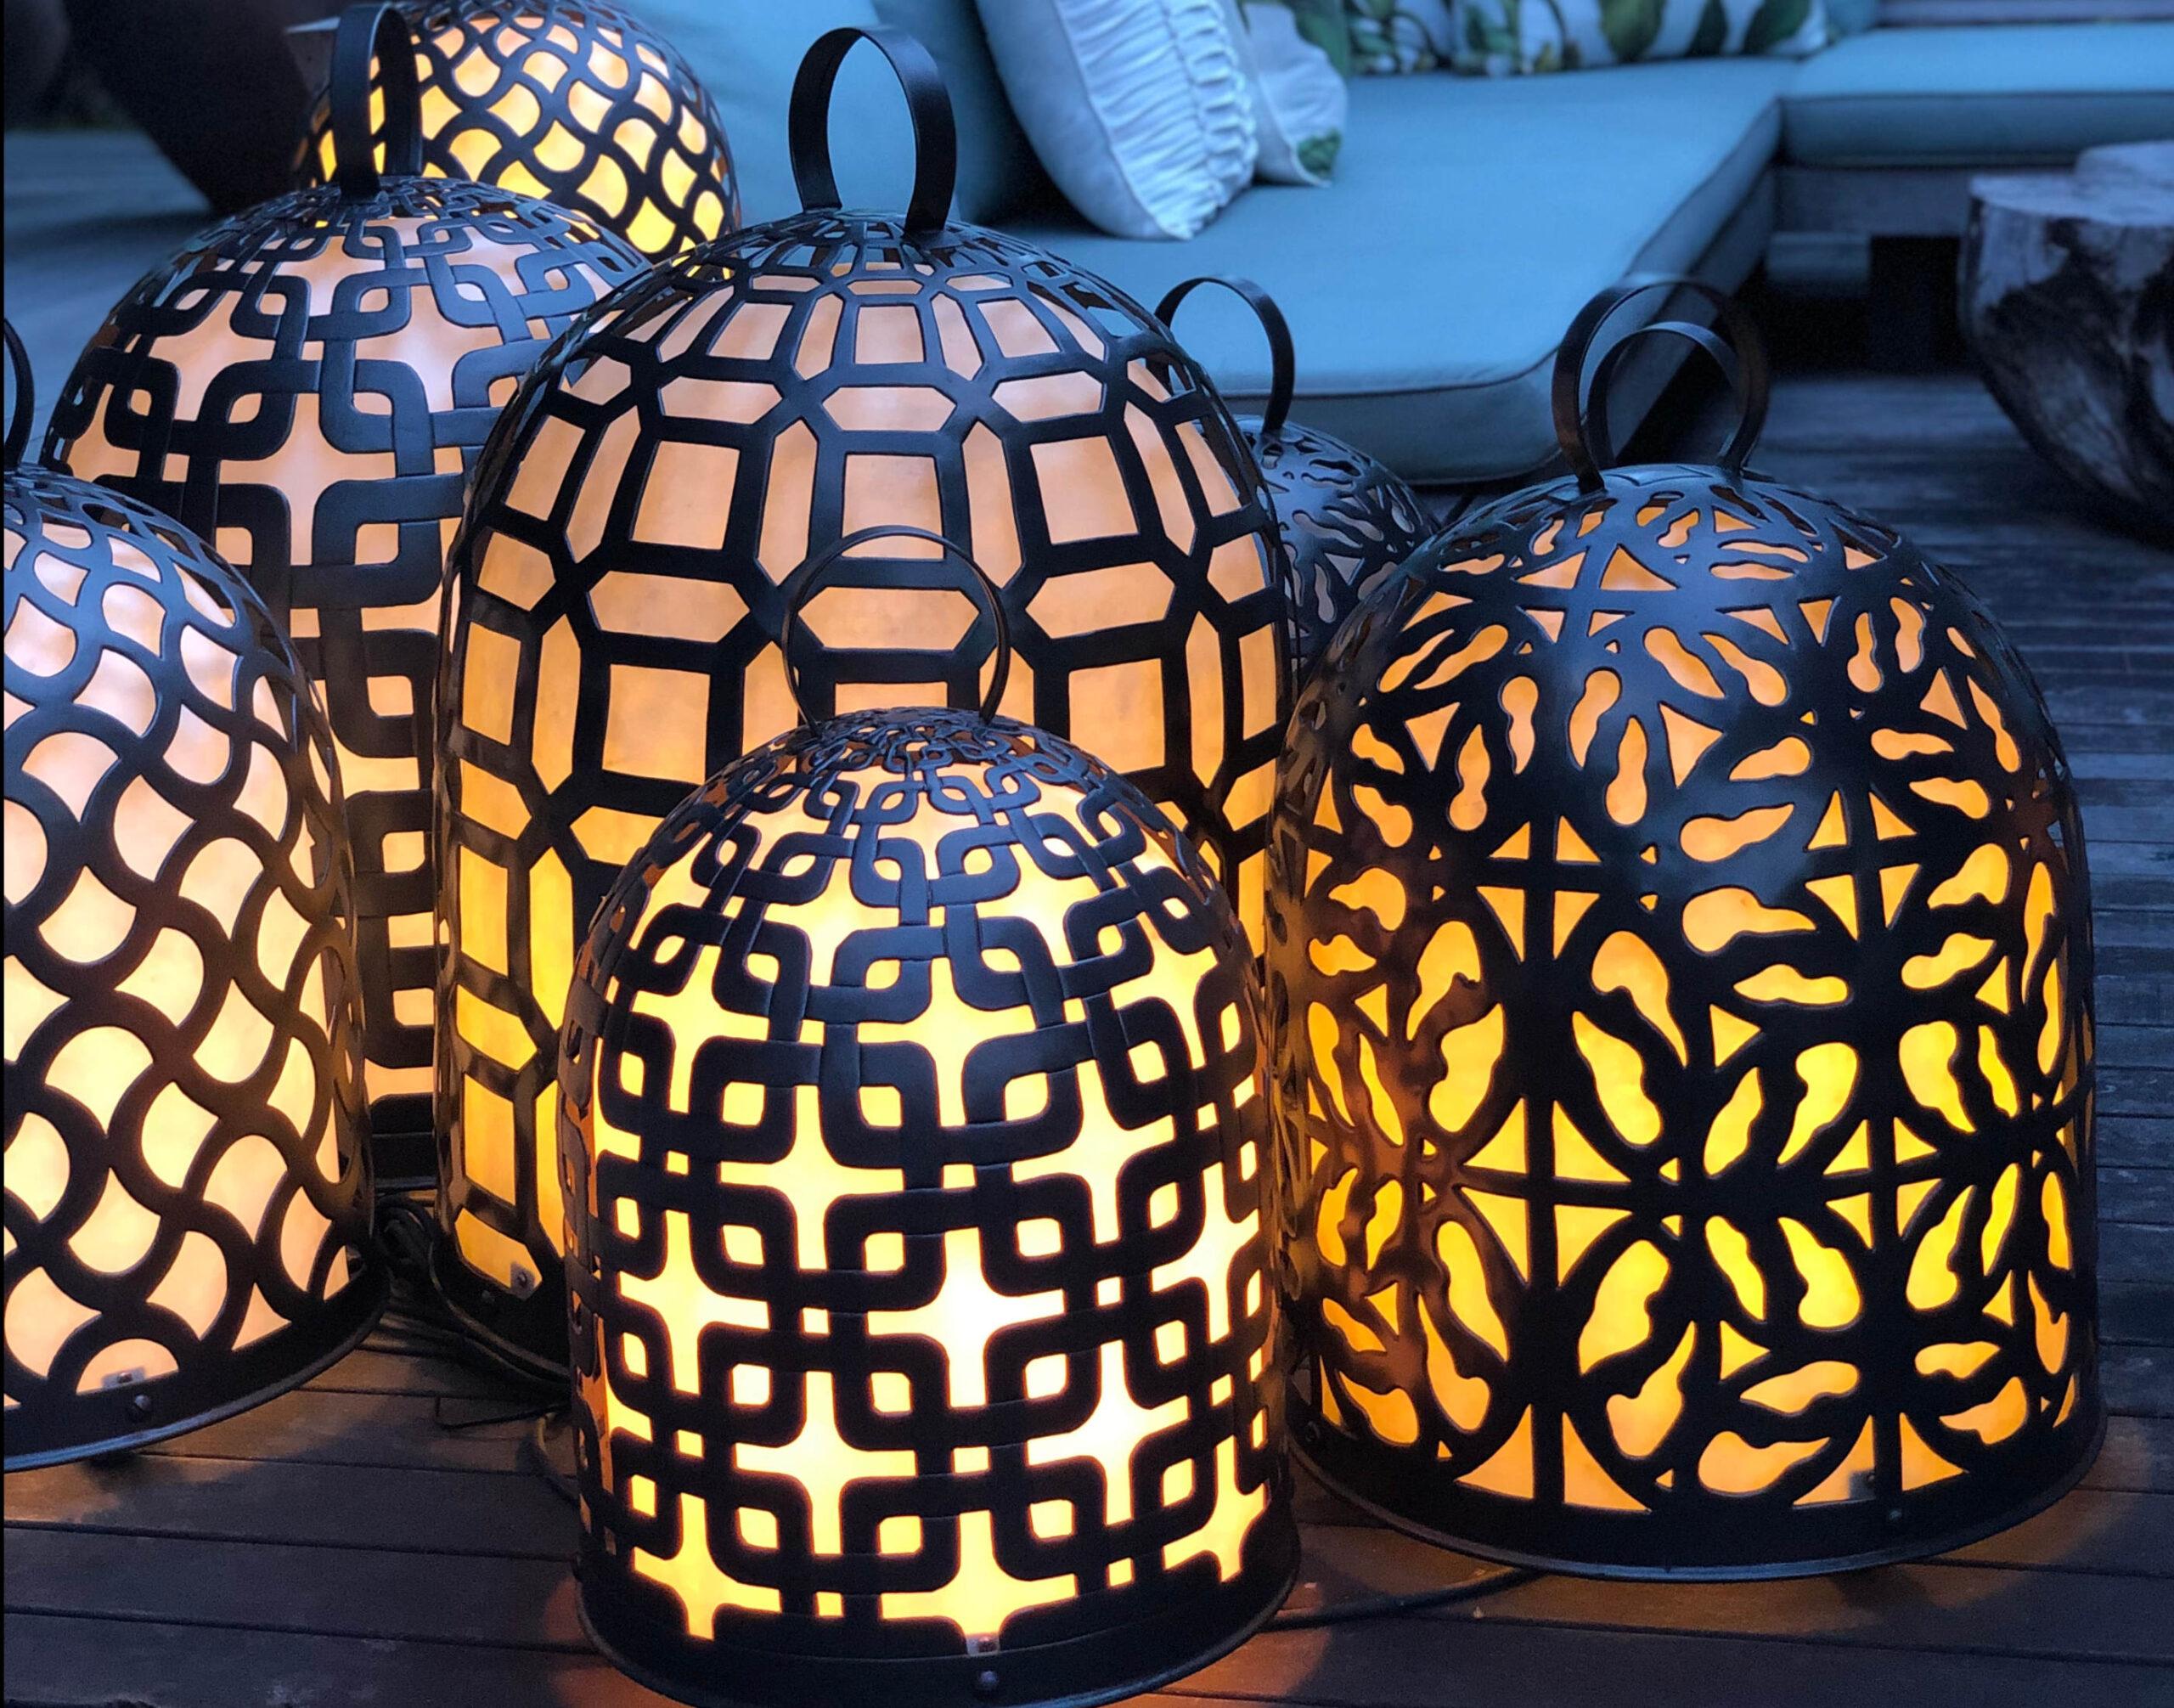 Livingdreams Lampe San Giorgio